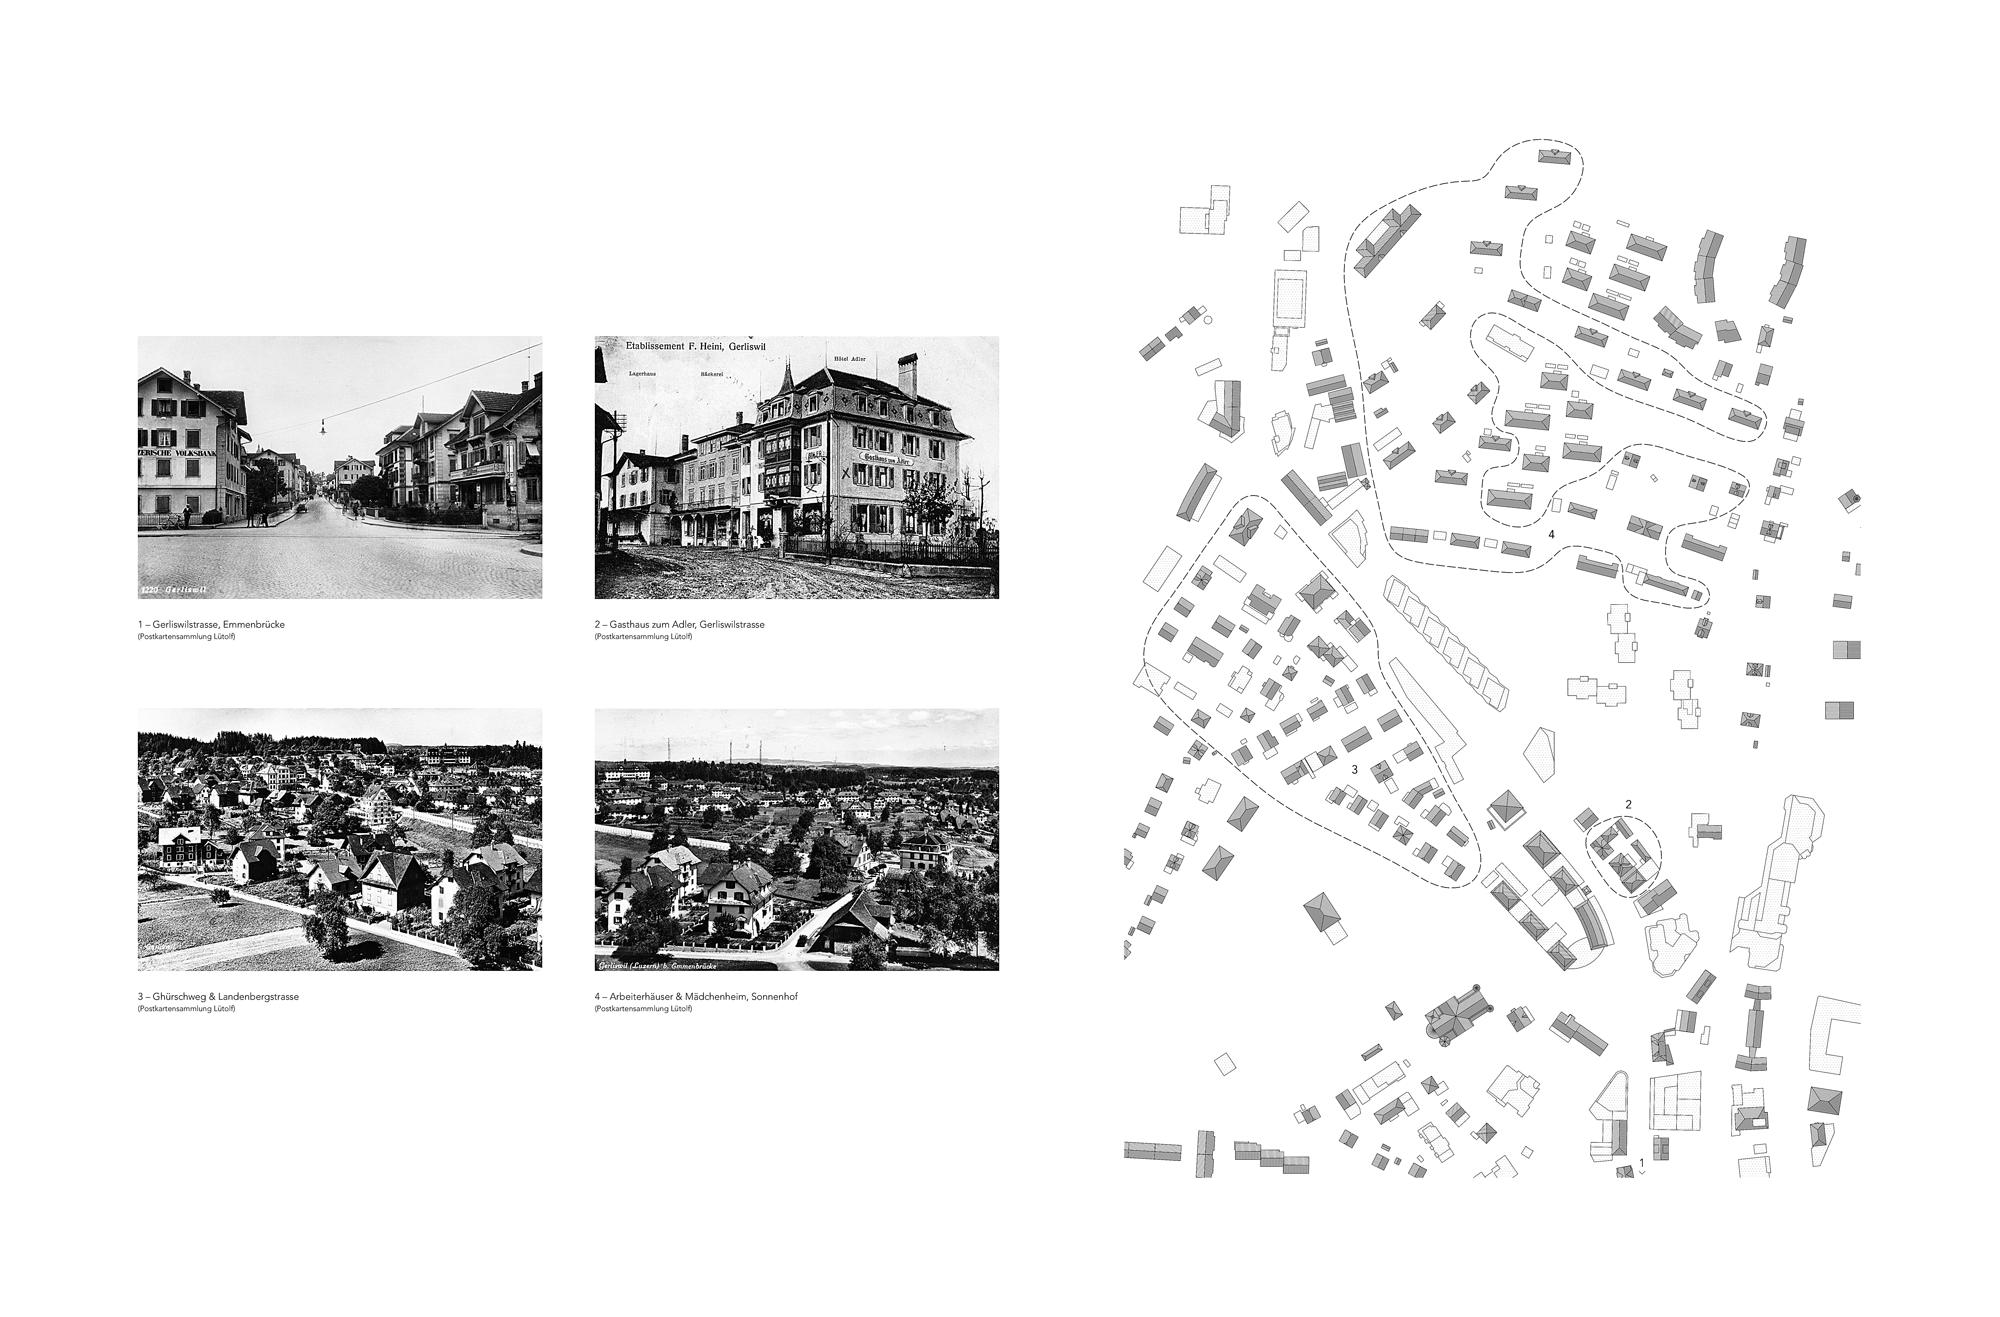 Referenzen & Baustruktur